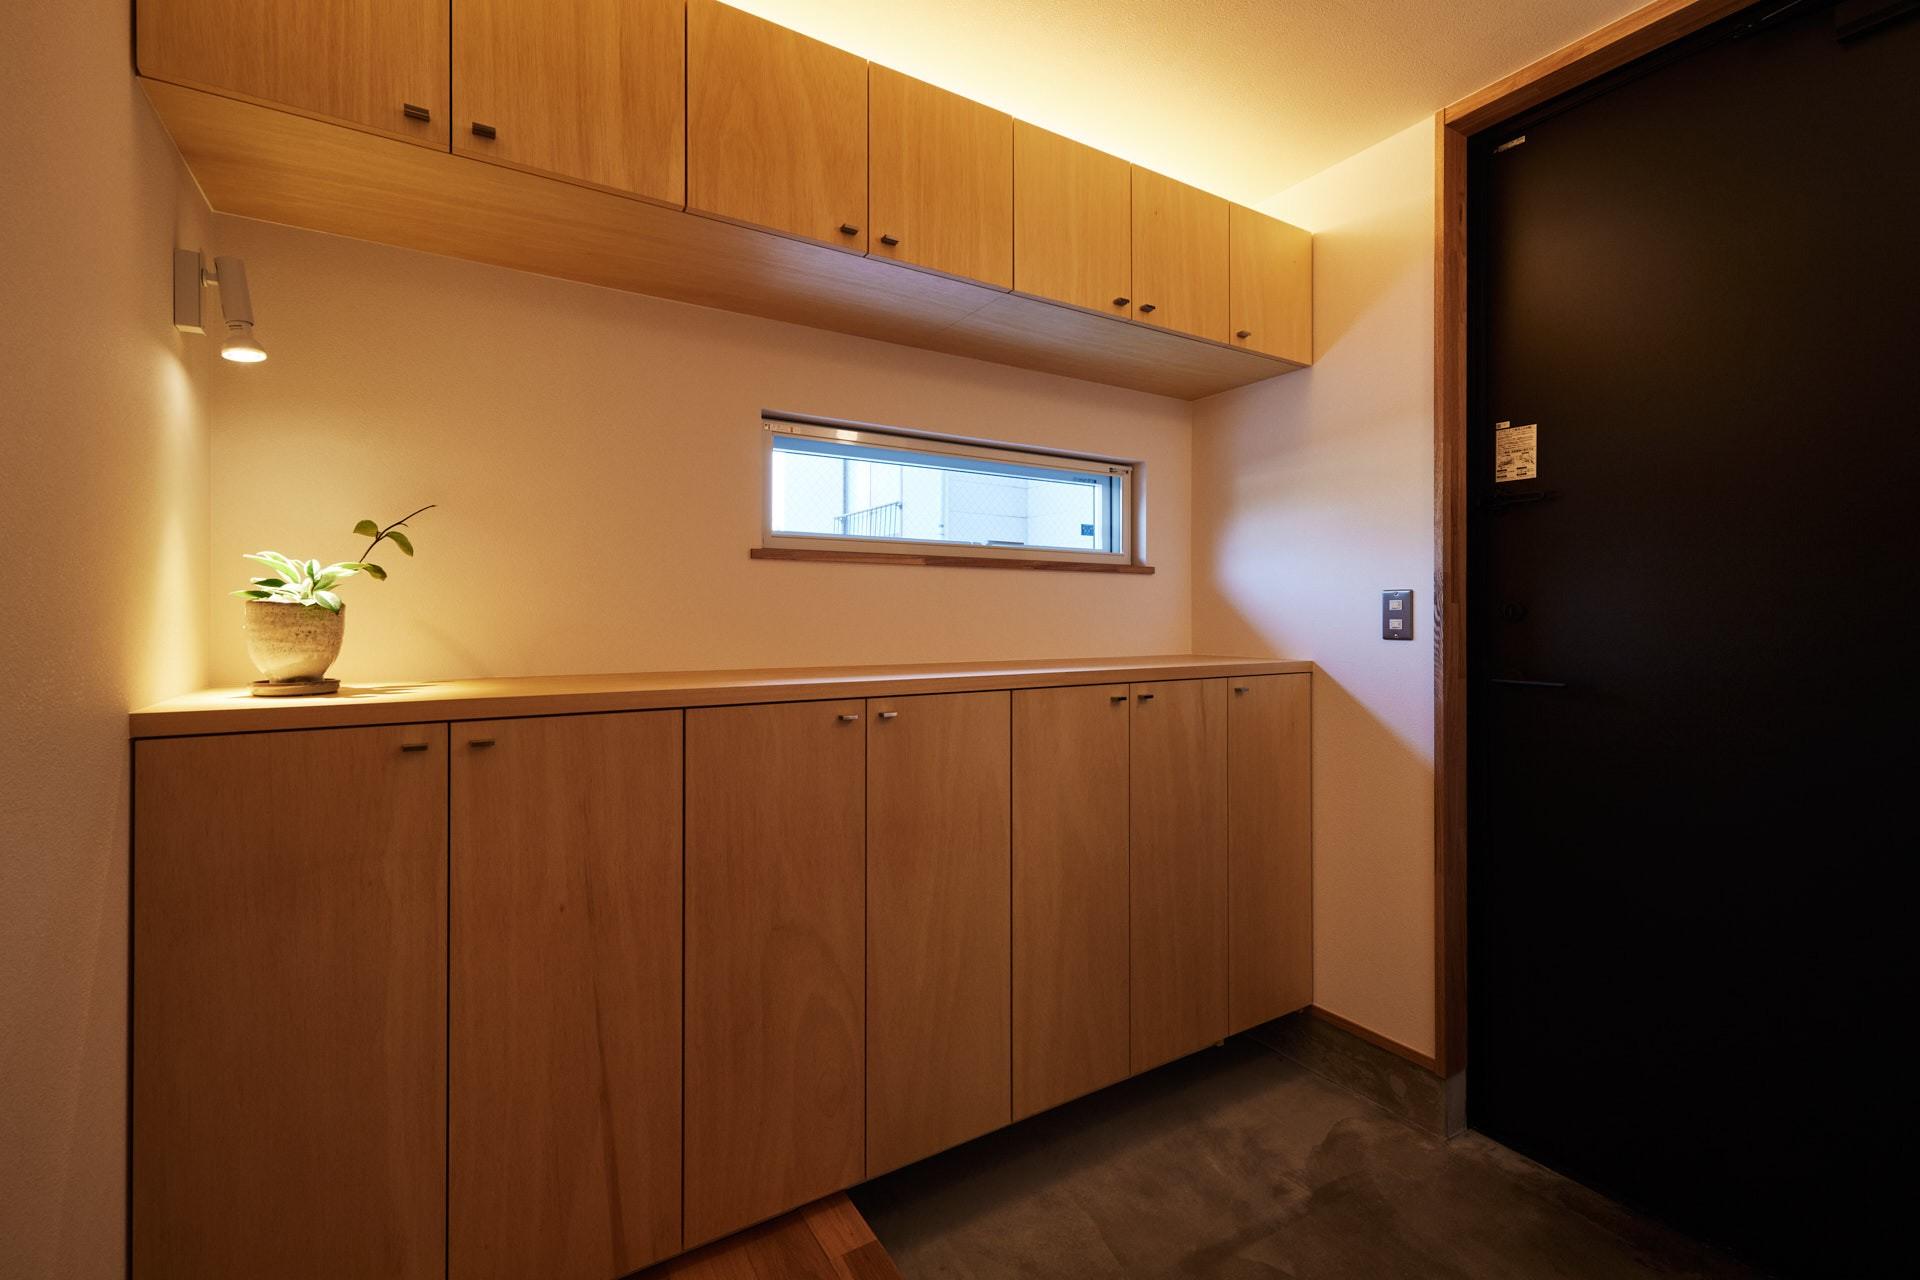 DETAIL HOME(ディテールホーム)「素材を楽しむ小さな家」のシンプル・ナチュラルな玄関の実例写真